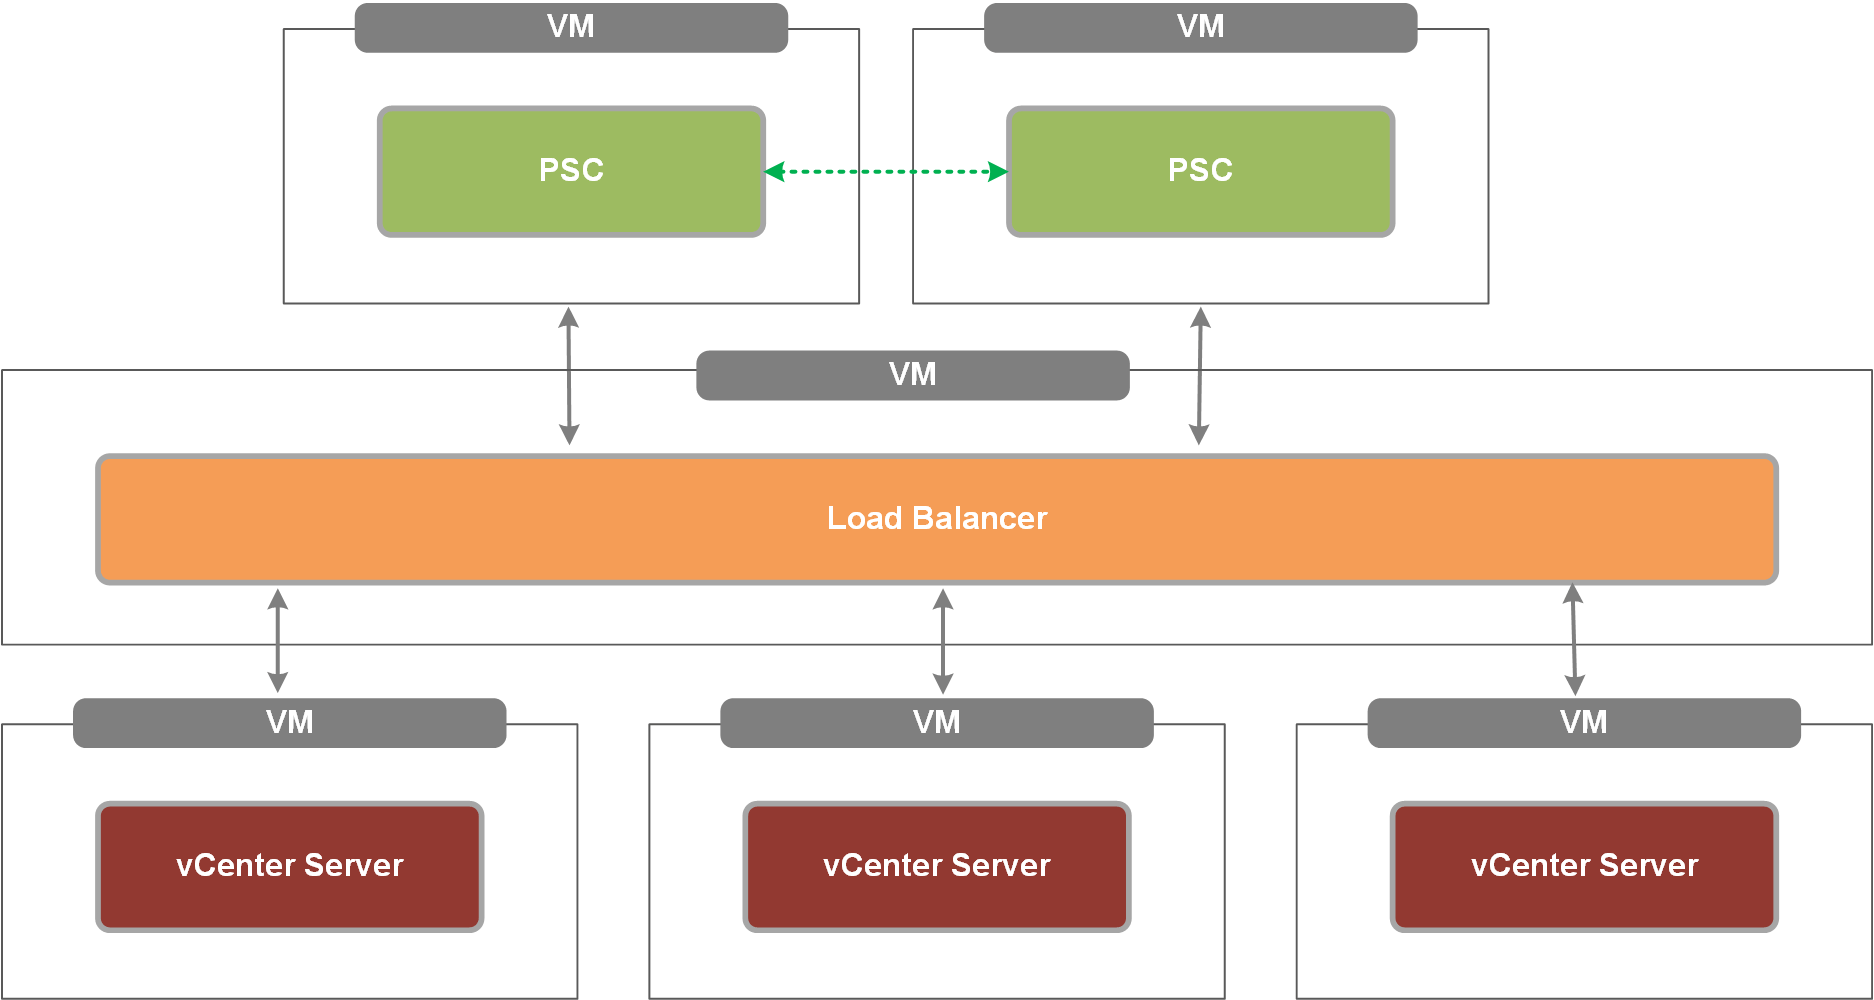 Vmware vsphere basics vcenter 6 5 upgrade scenarios for Vmware vsphere 6 architecture